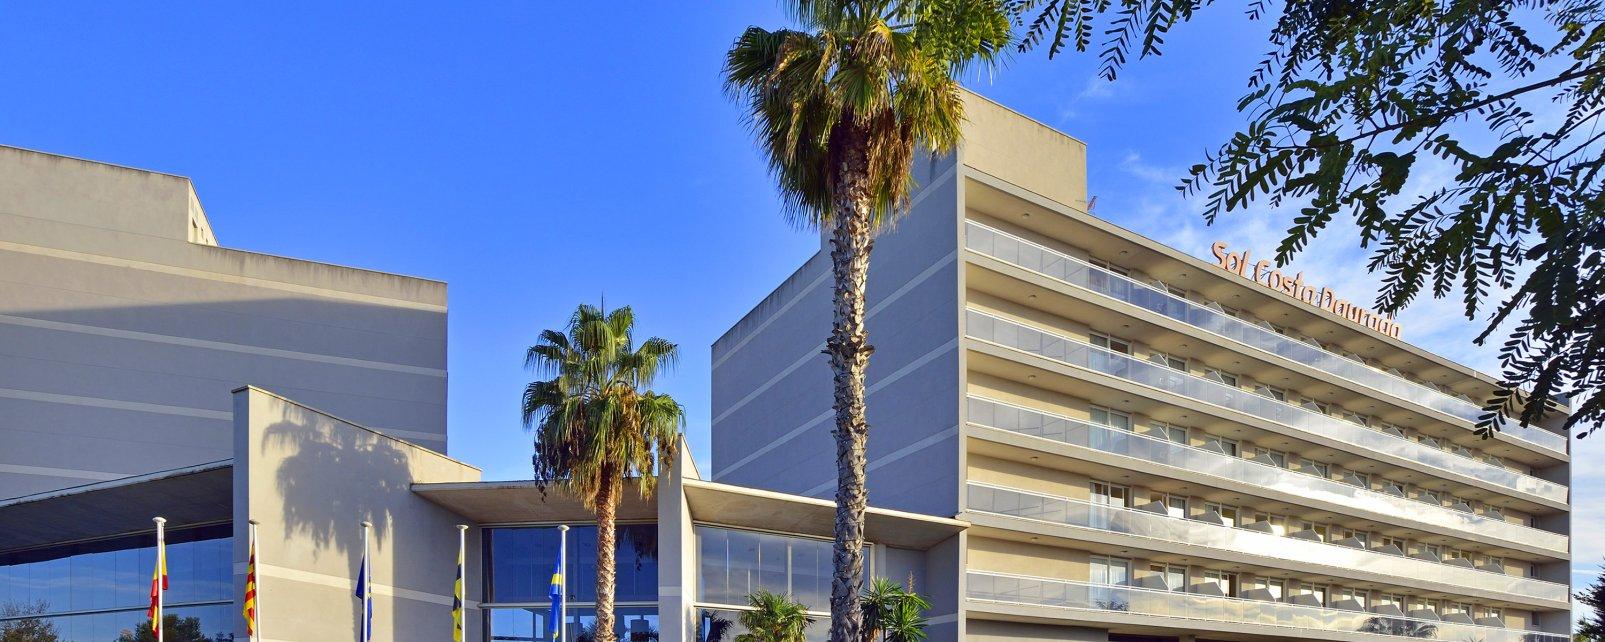 Hôtel Sol Costa Daurada